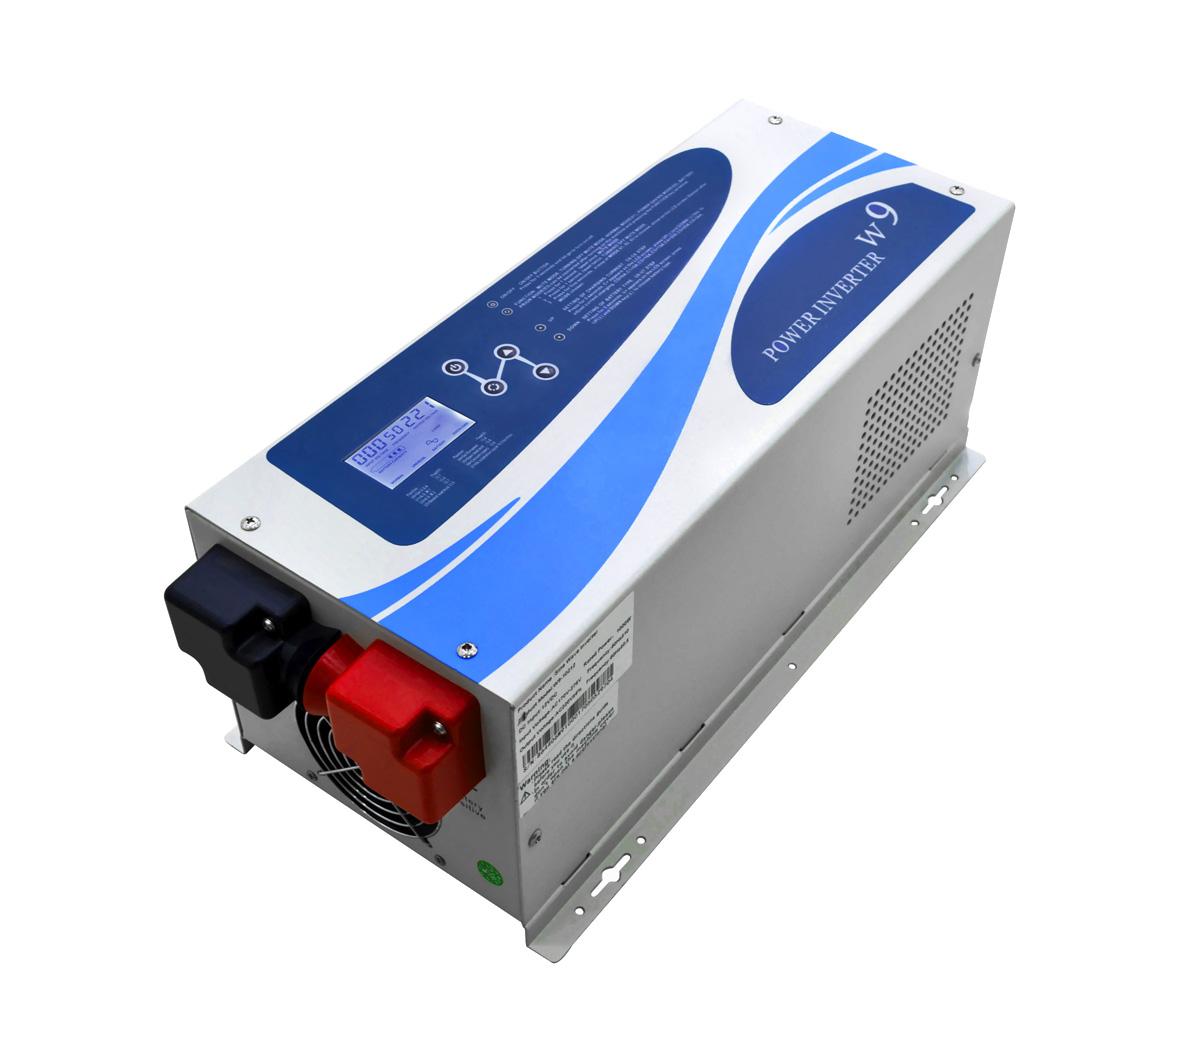 W9 pv inverter(1000w-1500w)